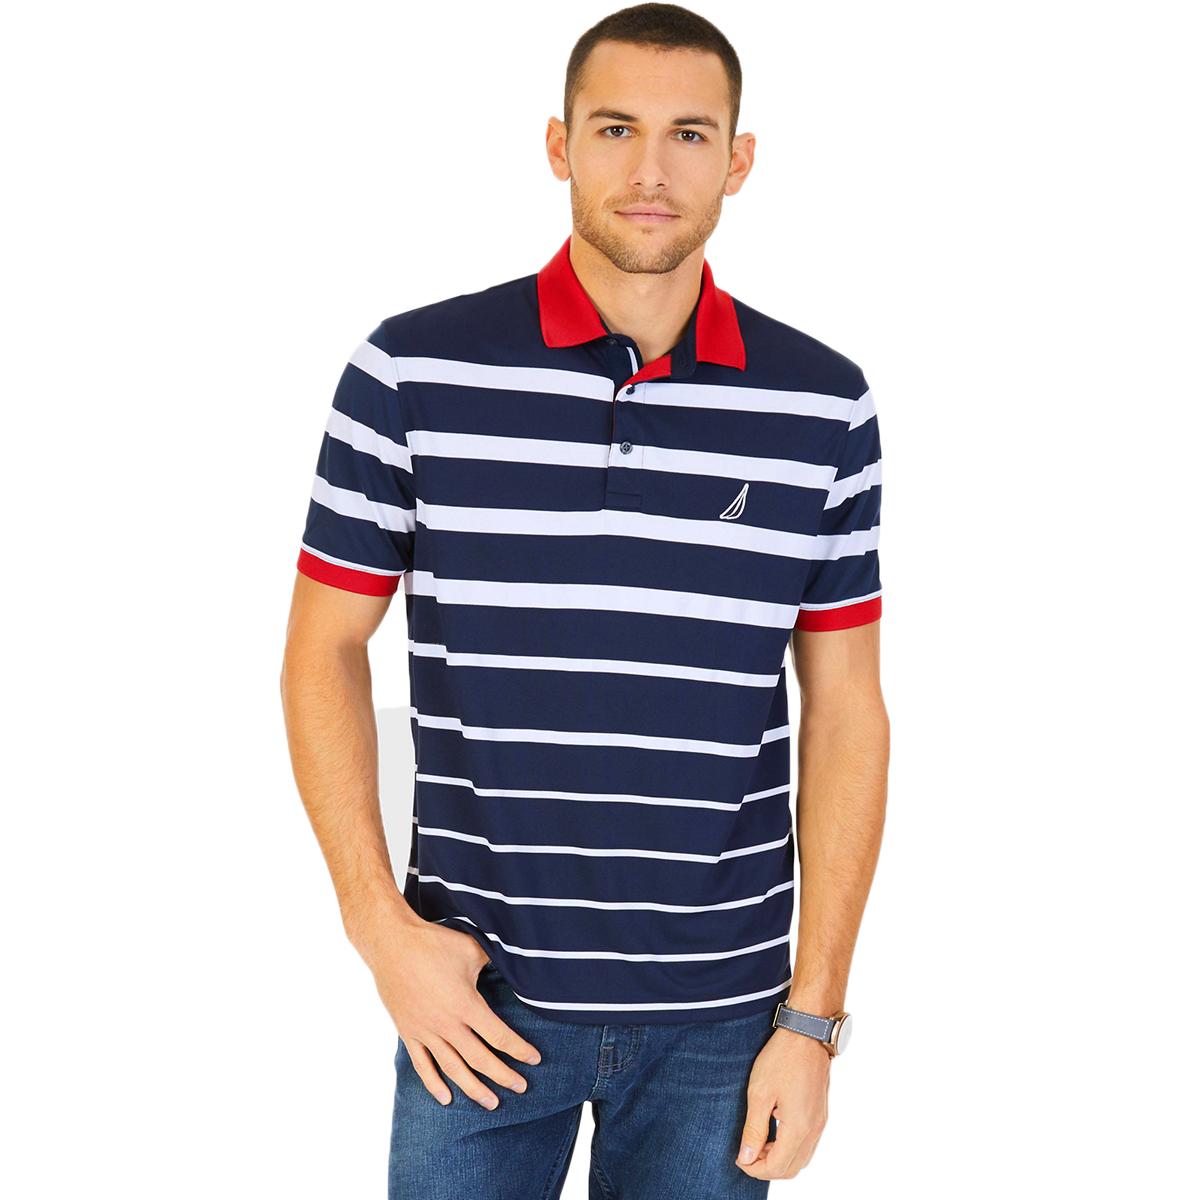 Nautica Men's Striped Performance Polo Shirt - Blue, M